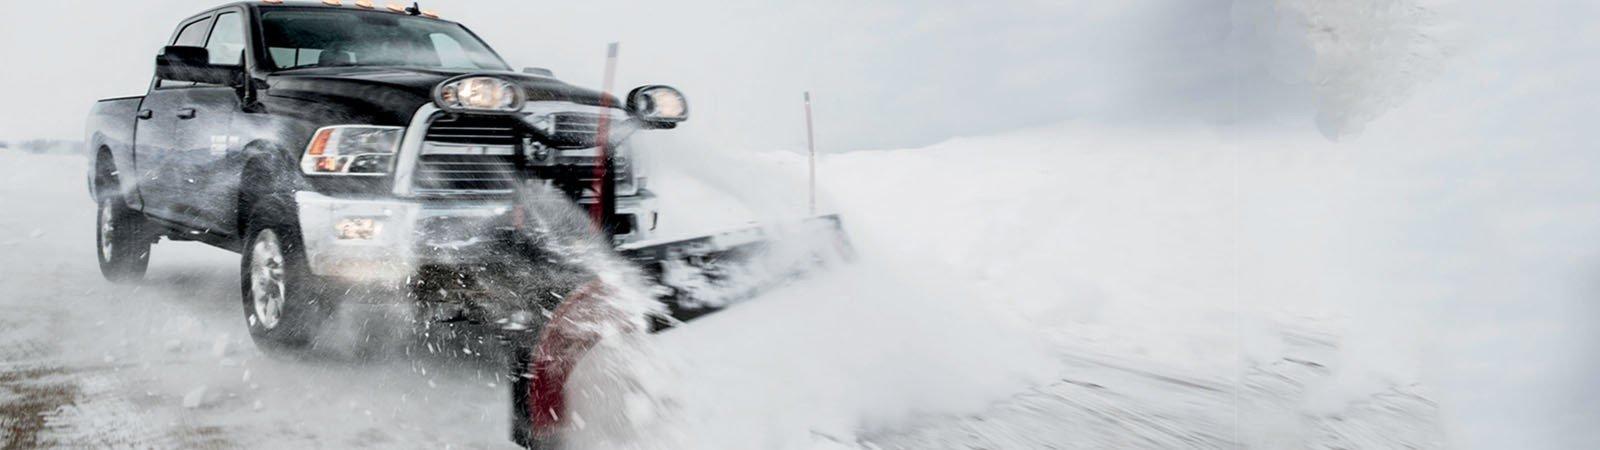 RAM truck plowing snow on a snowy road